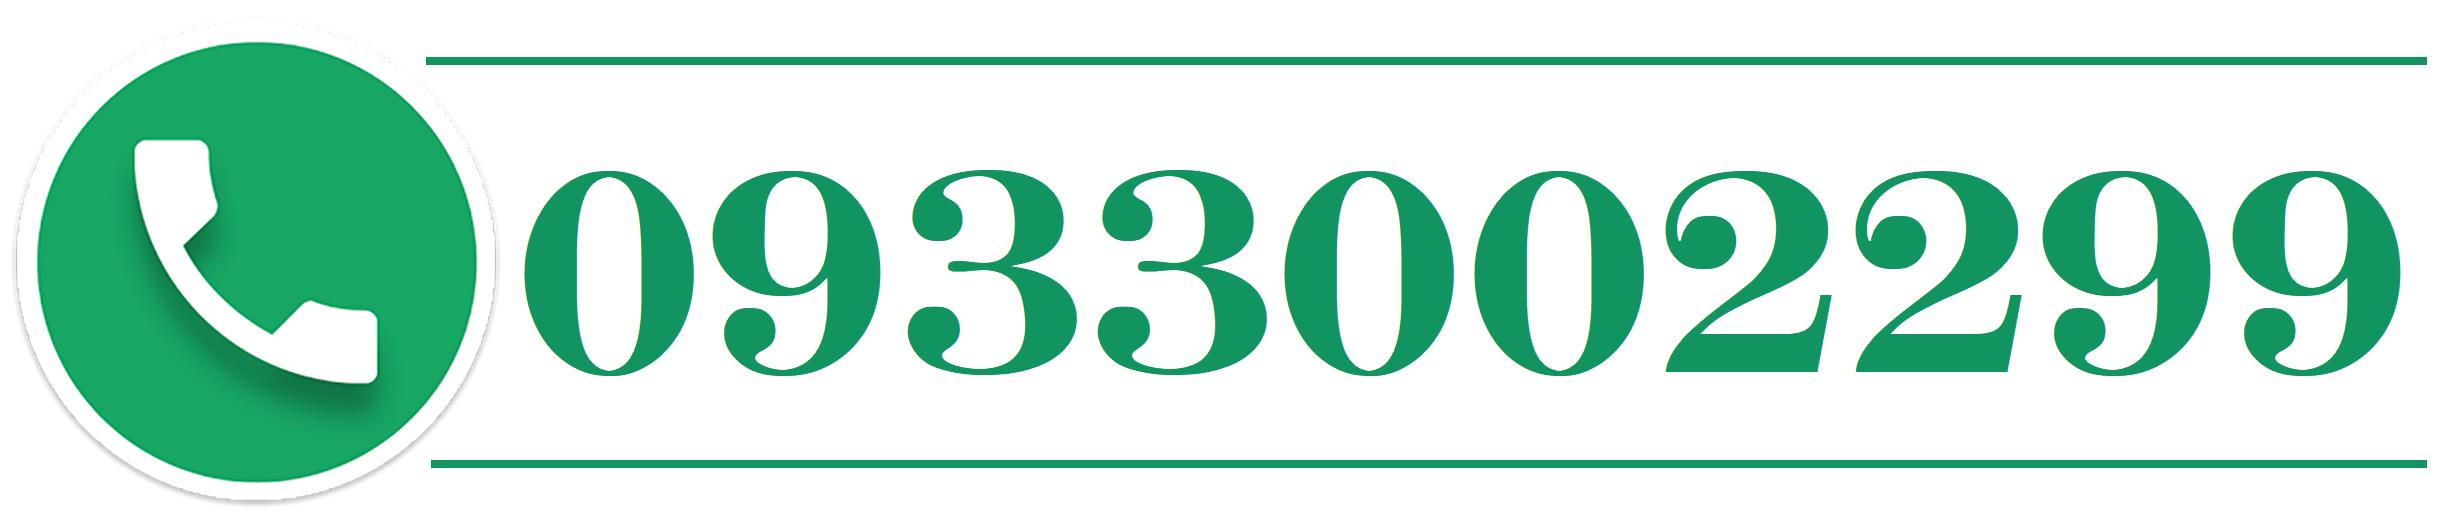 0933002299